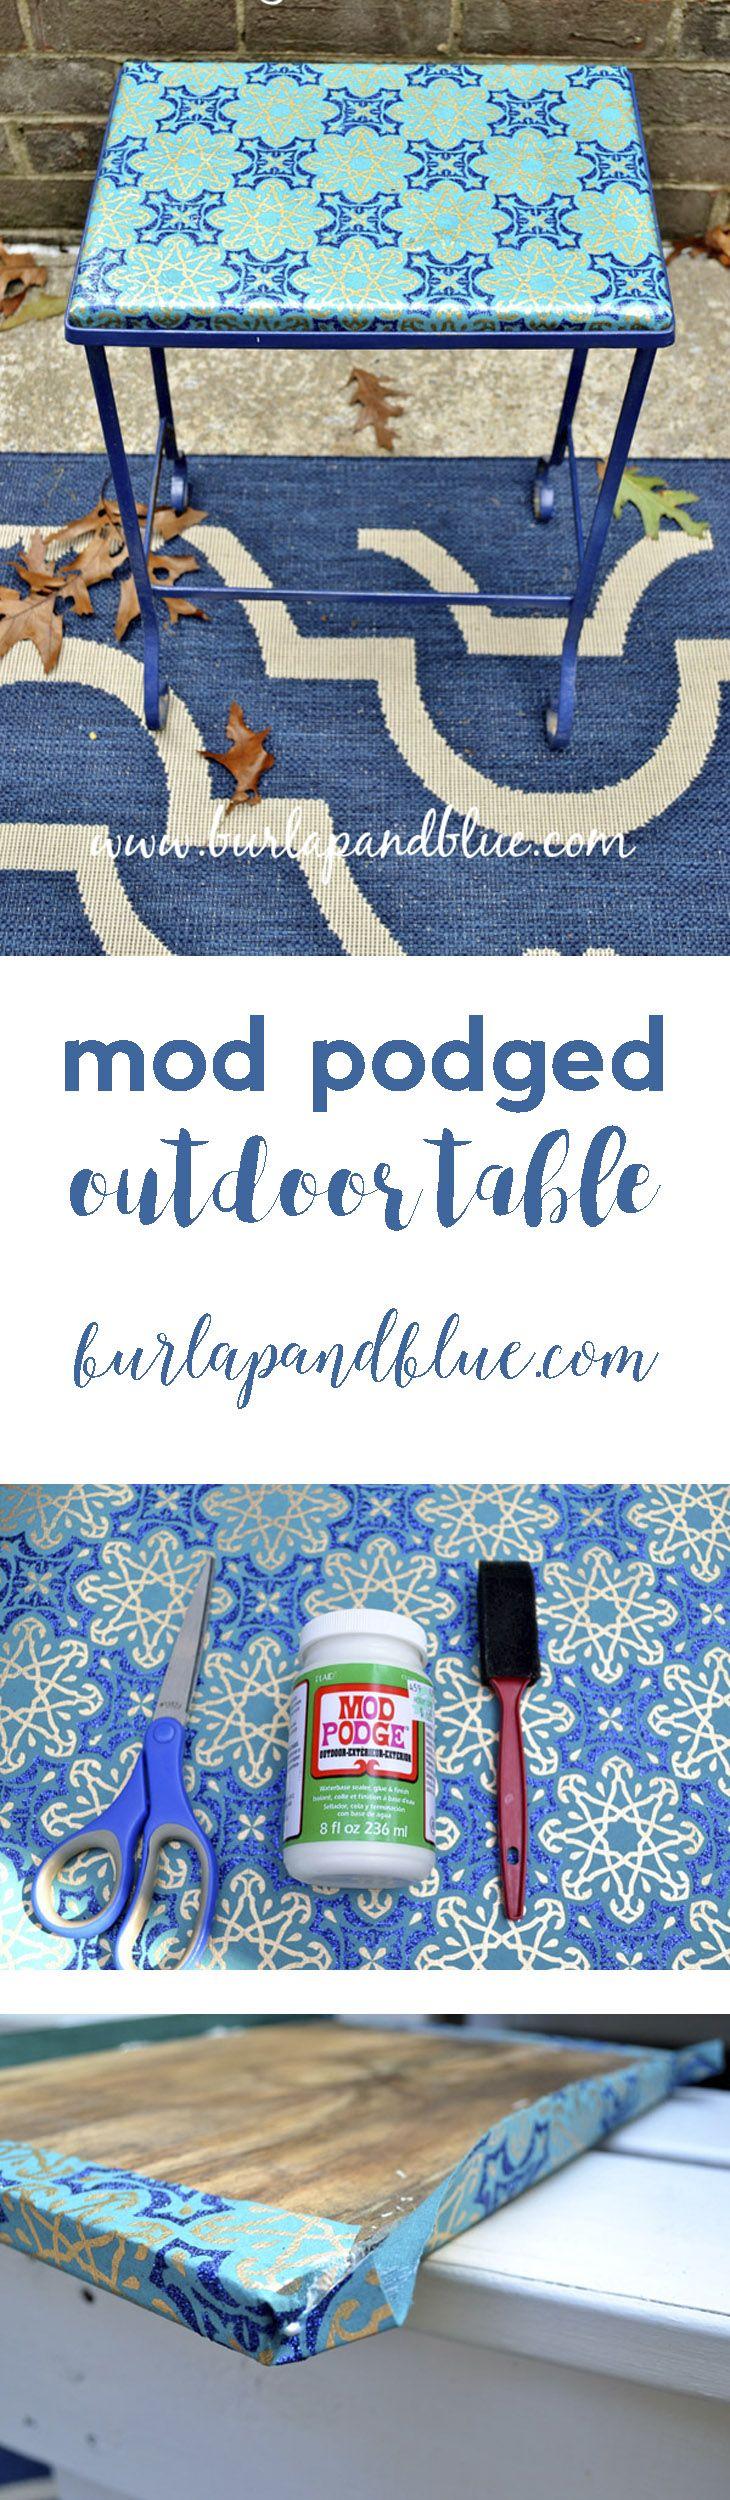 37 best Celebrate Mod Podge images on Pinterest   Bricolage, Craft ...